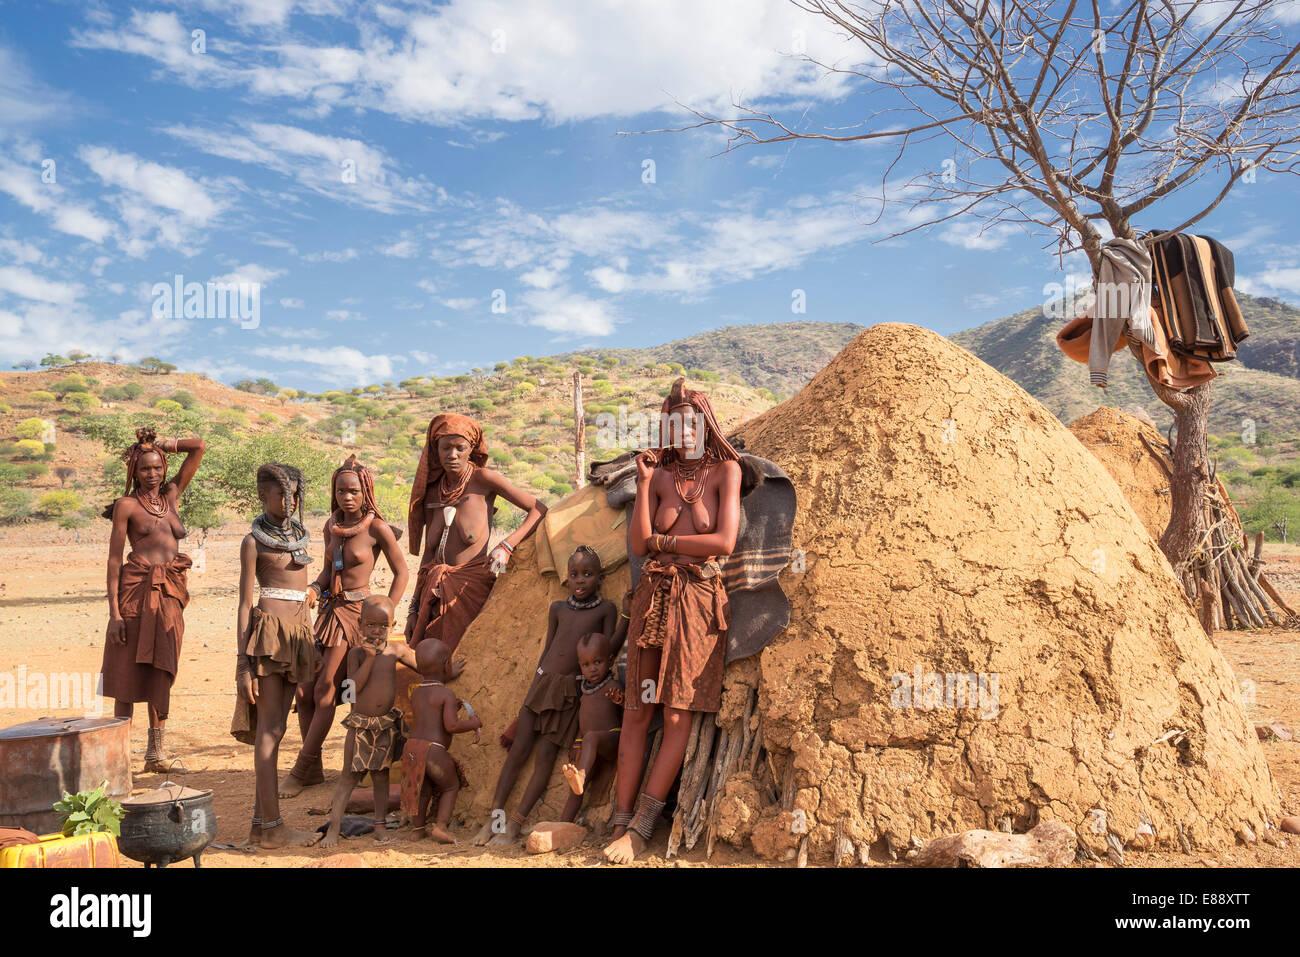 Himba people, Kaokoland, Namibia, Africa - Stock Image